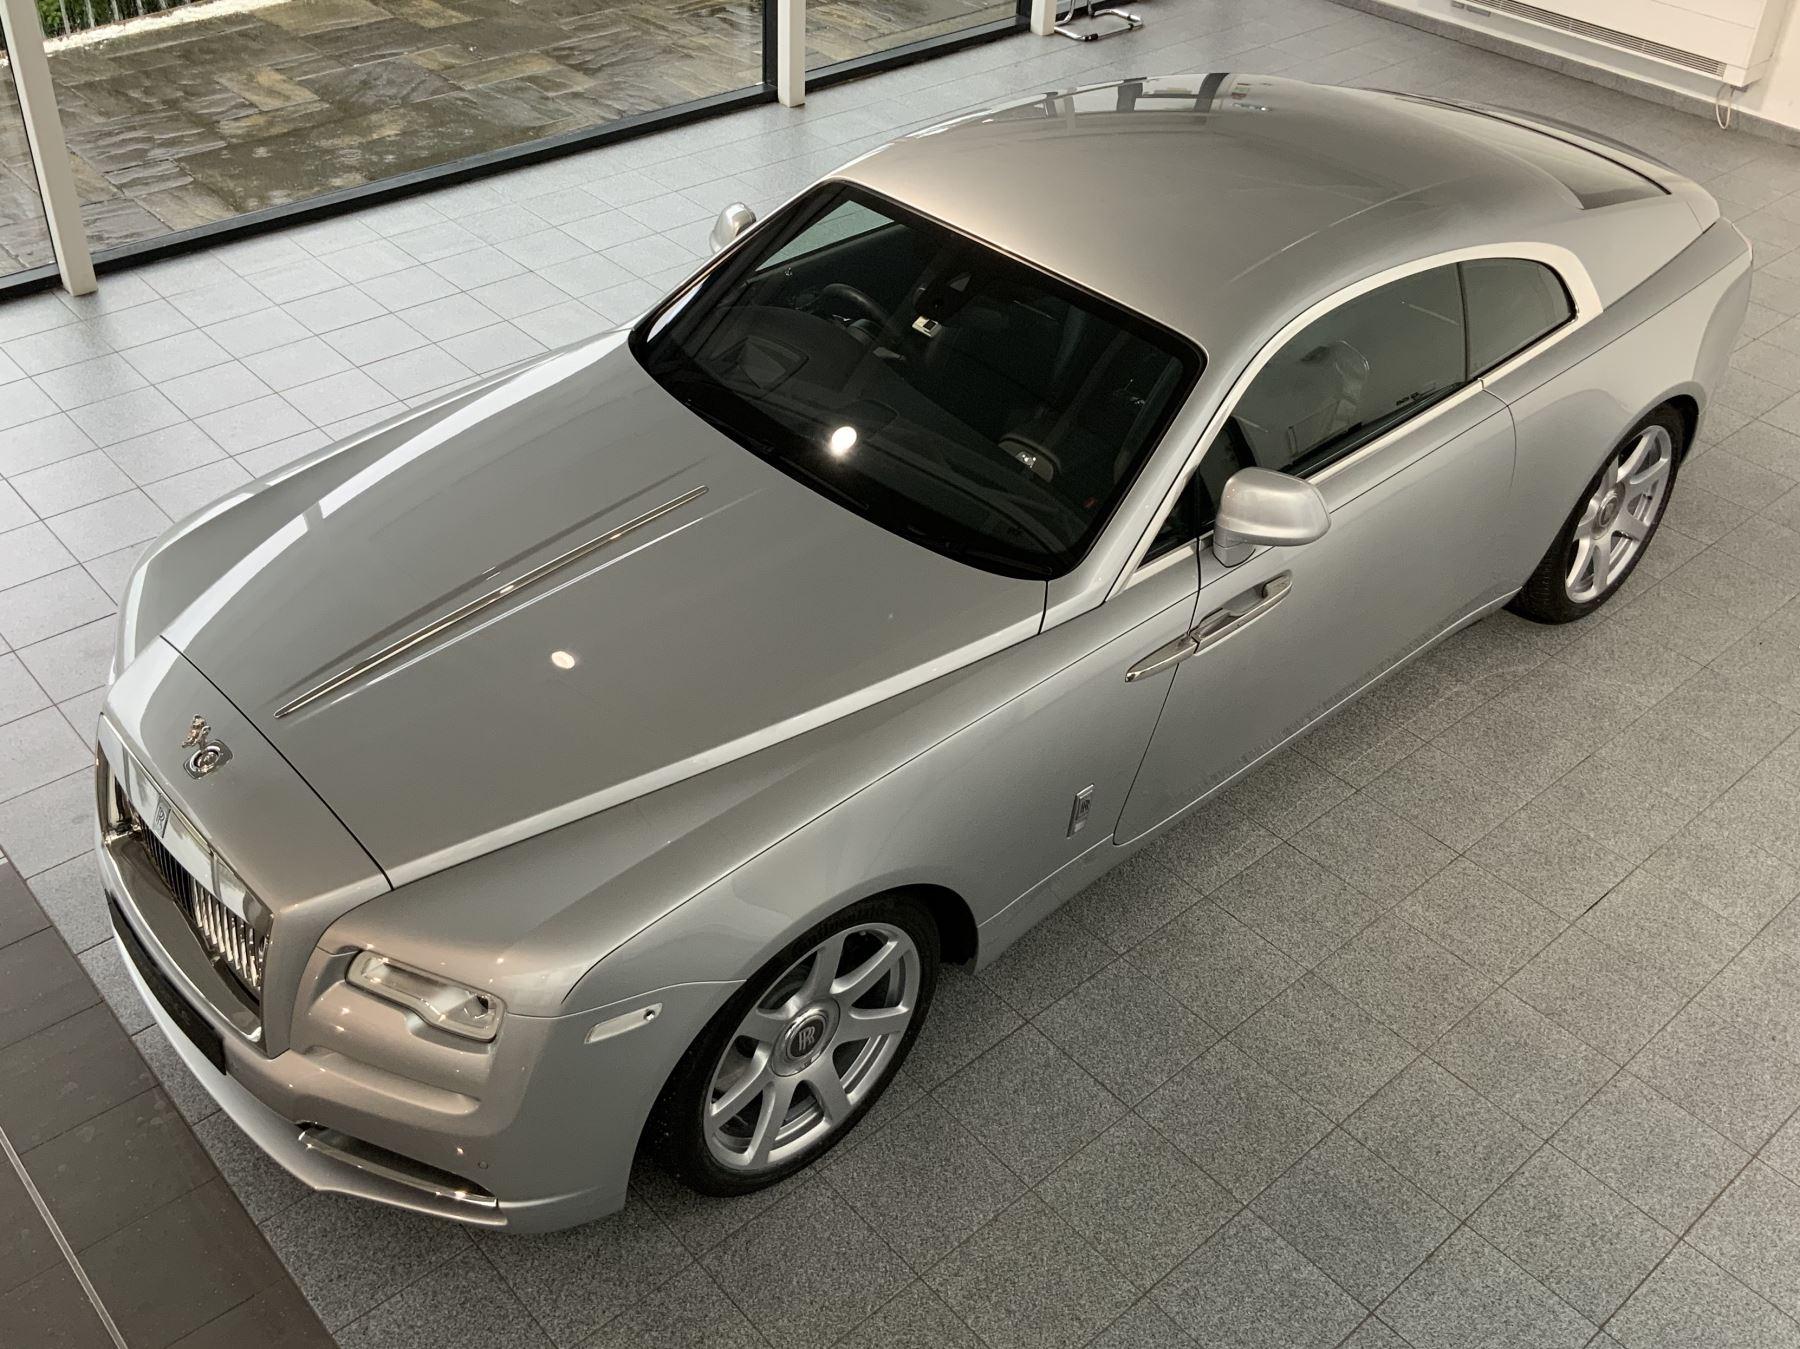 Rolls-Royce Wraith V12 image 8